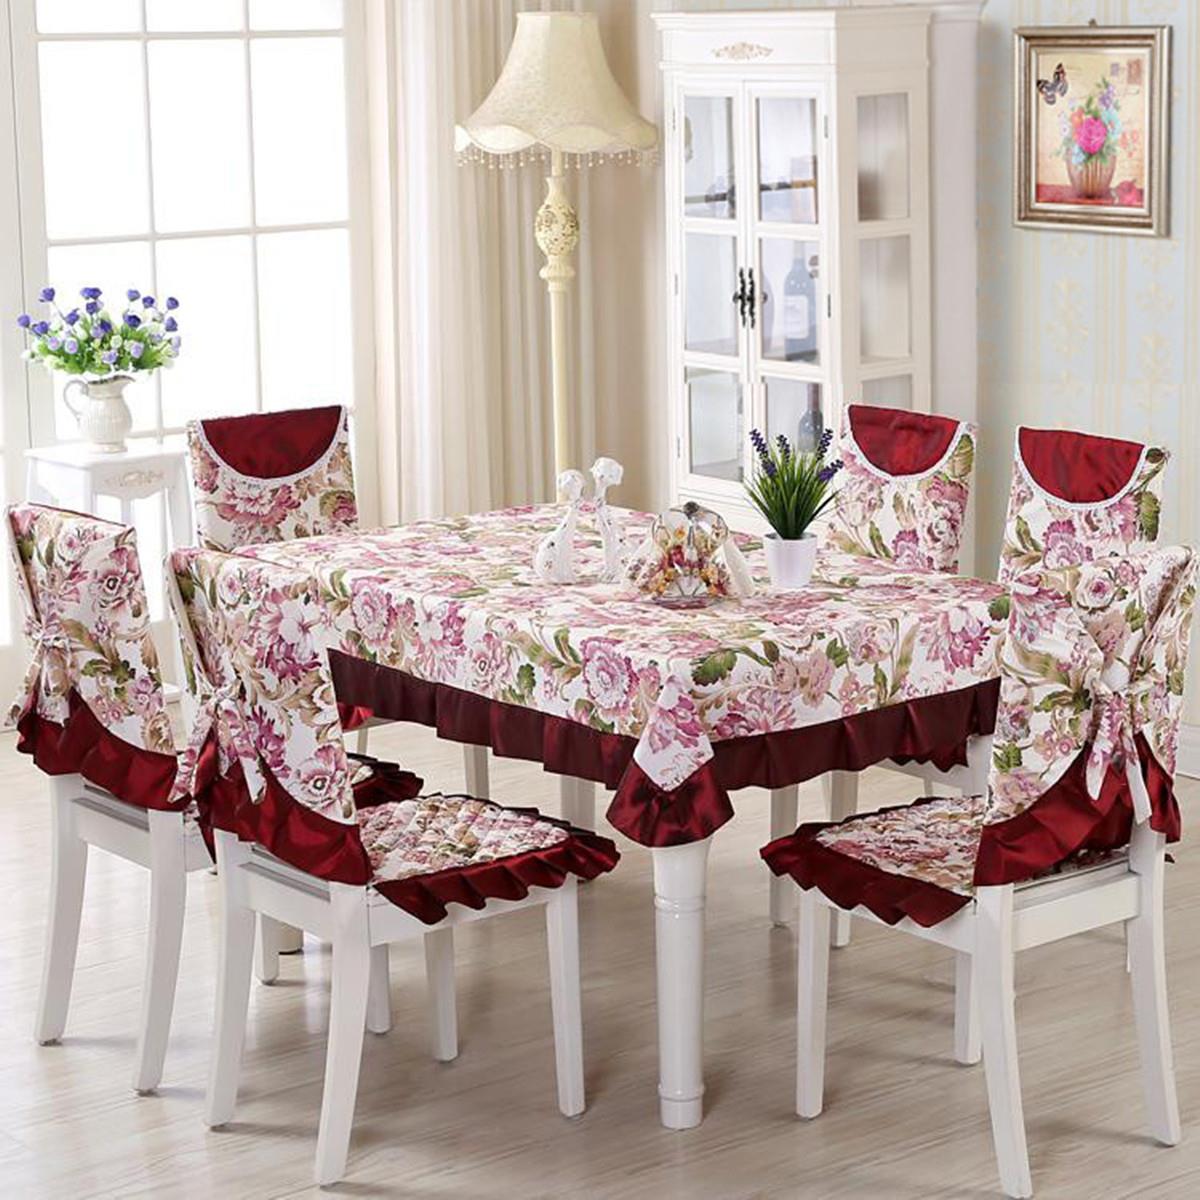 Online Get Cheap Crochet Table Cover Aliexpress